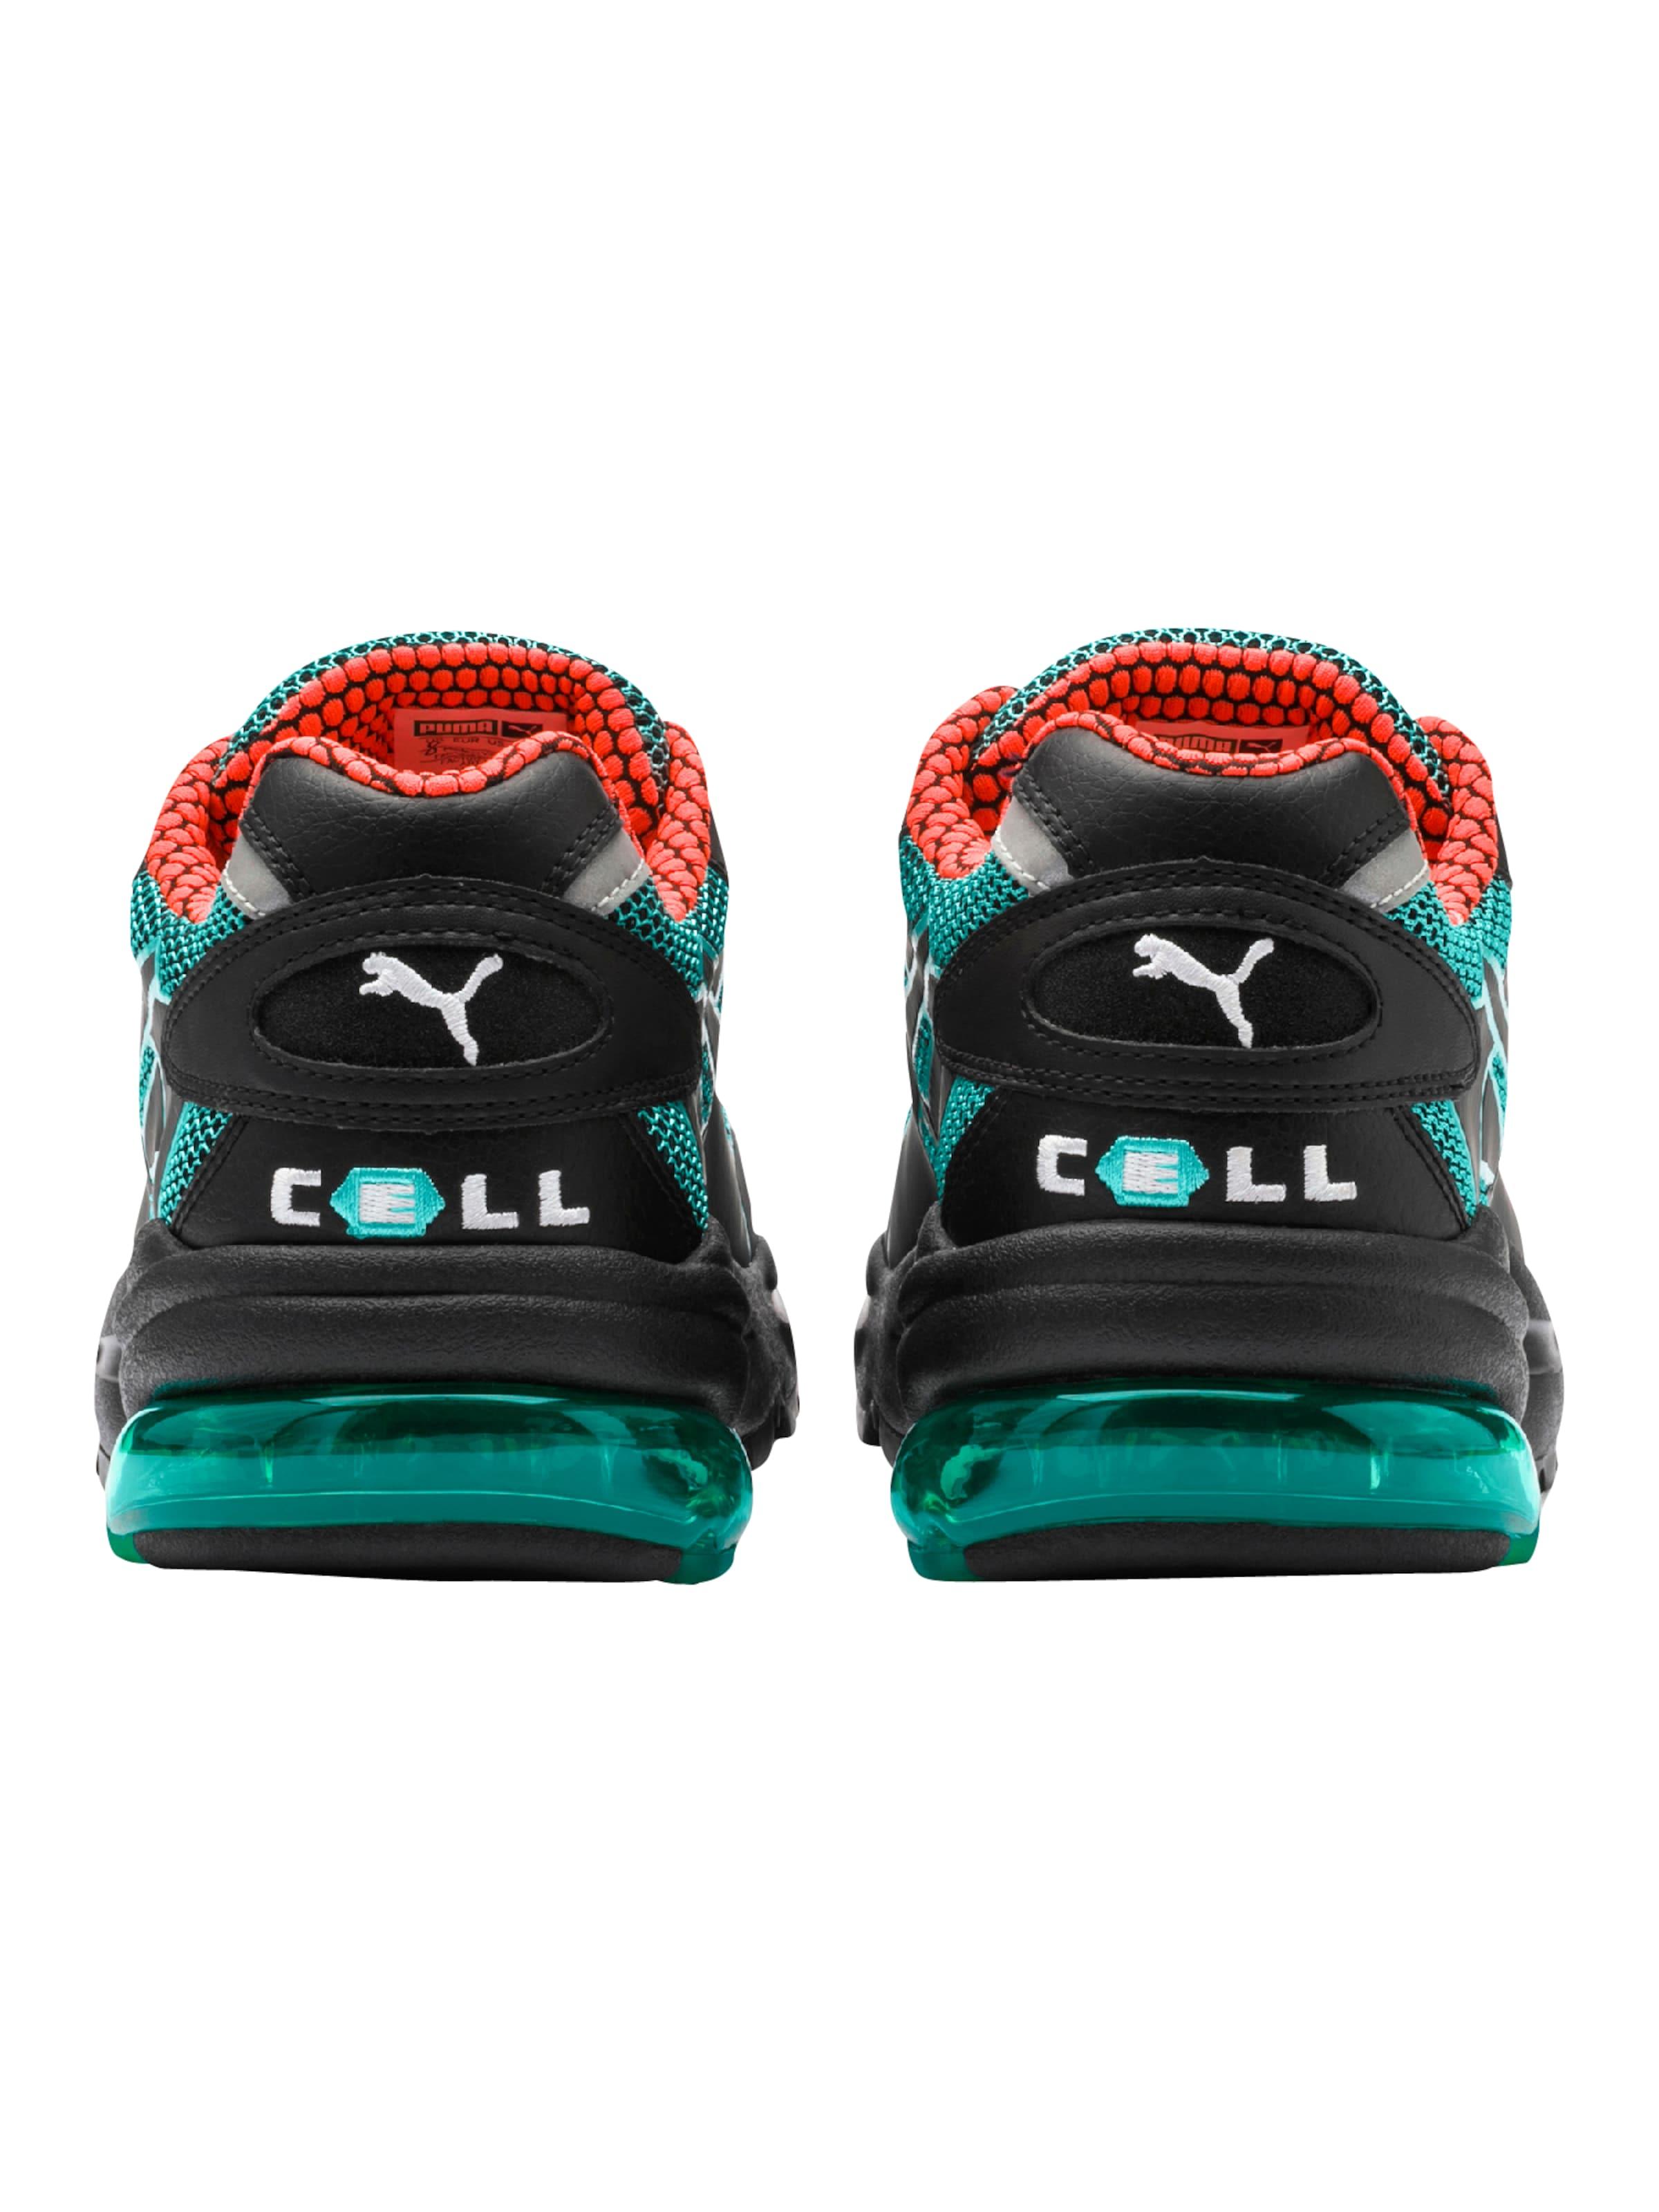 Puma Alien TurquoiseNoir Baskets Kotto' 'cell Basses En jpVUqSzMLG